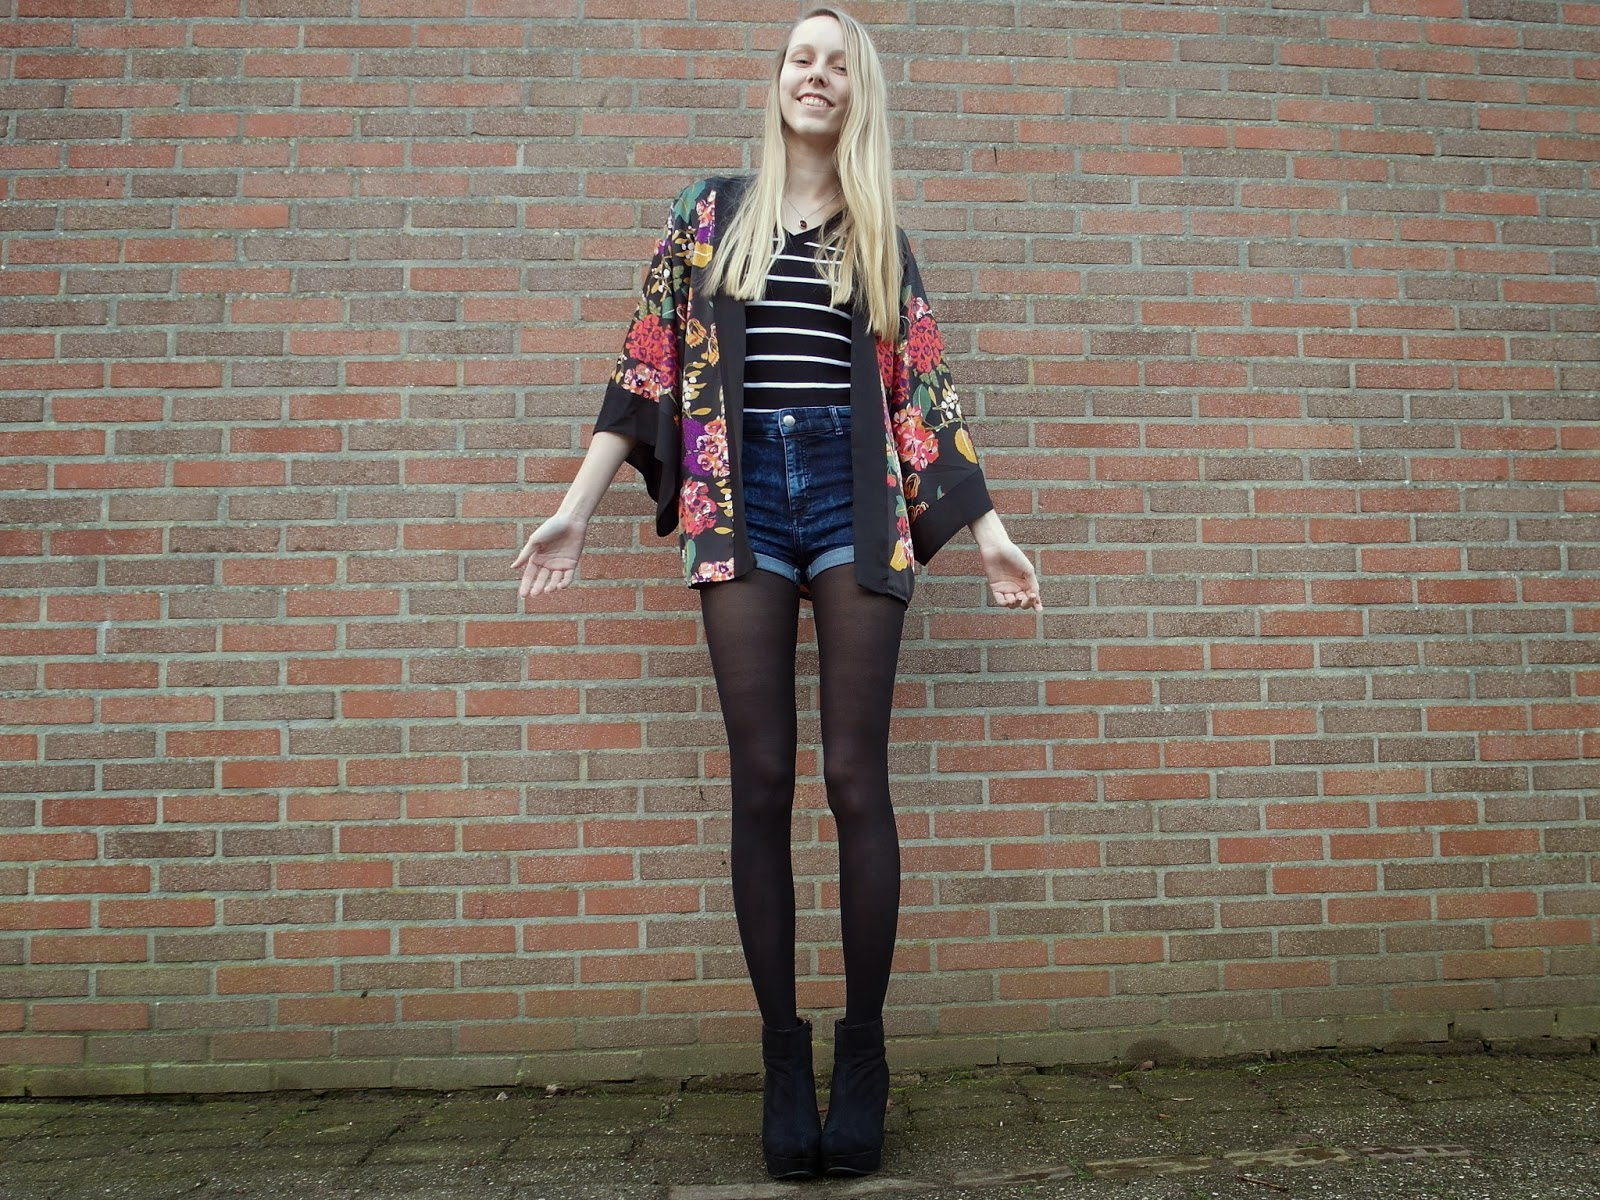 Zwarte kimono H&M divided shorts jeansshort kort spijkerbroekje outfit inspiratie Soshin panty blog